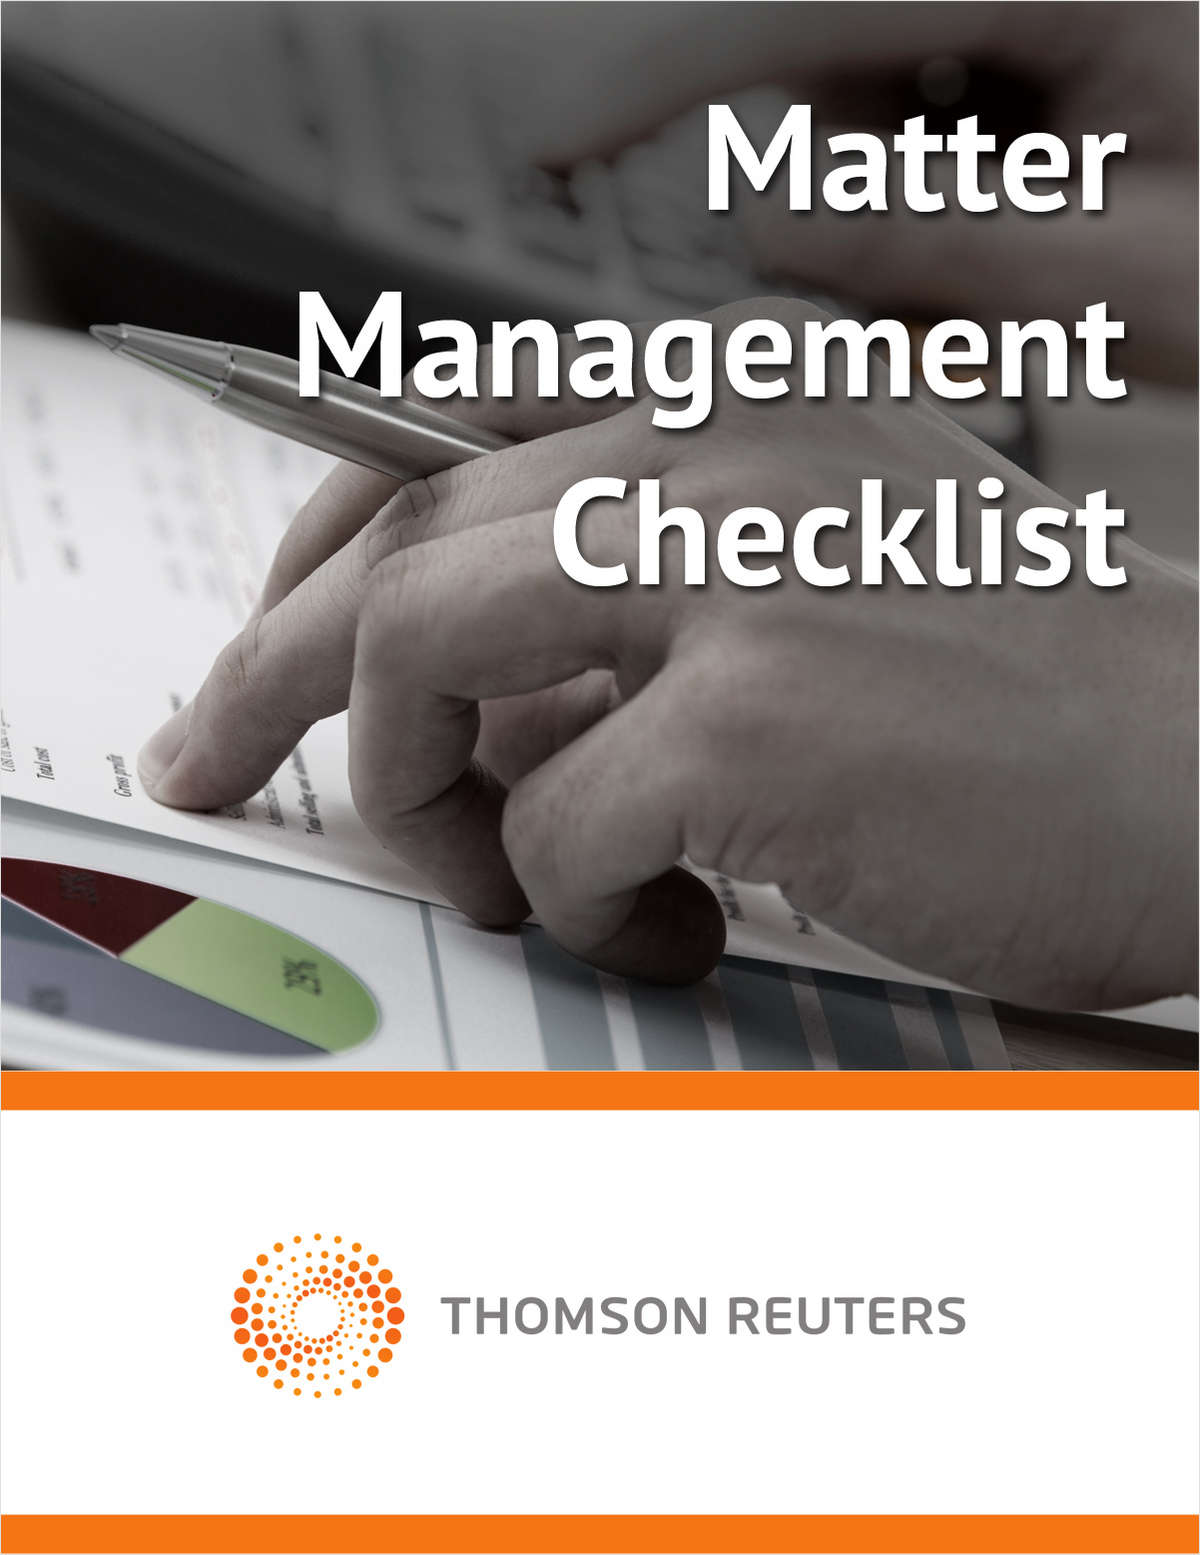 Matter Management Checklist